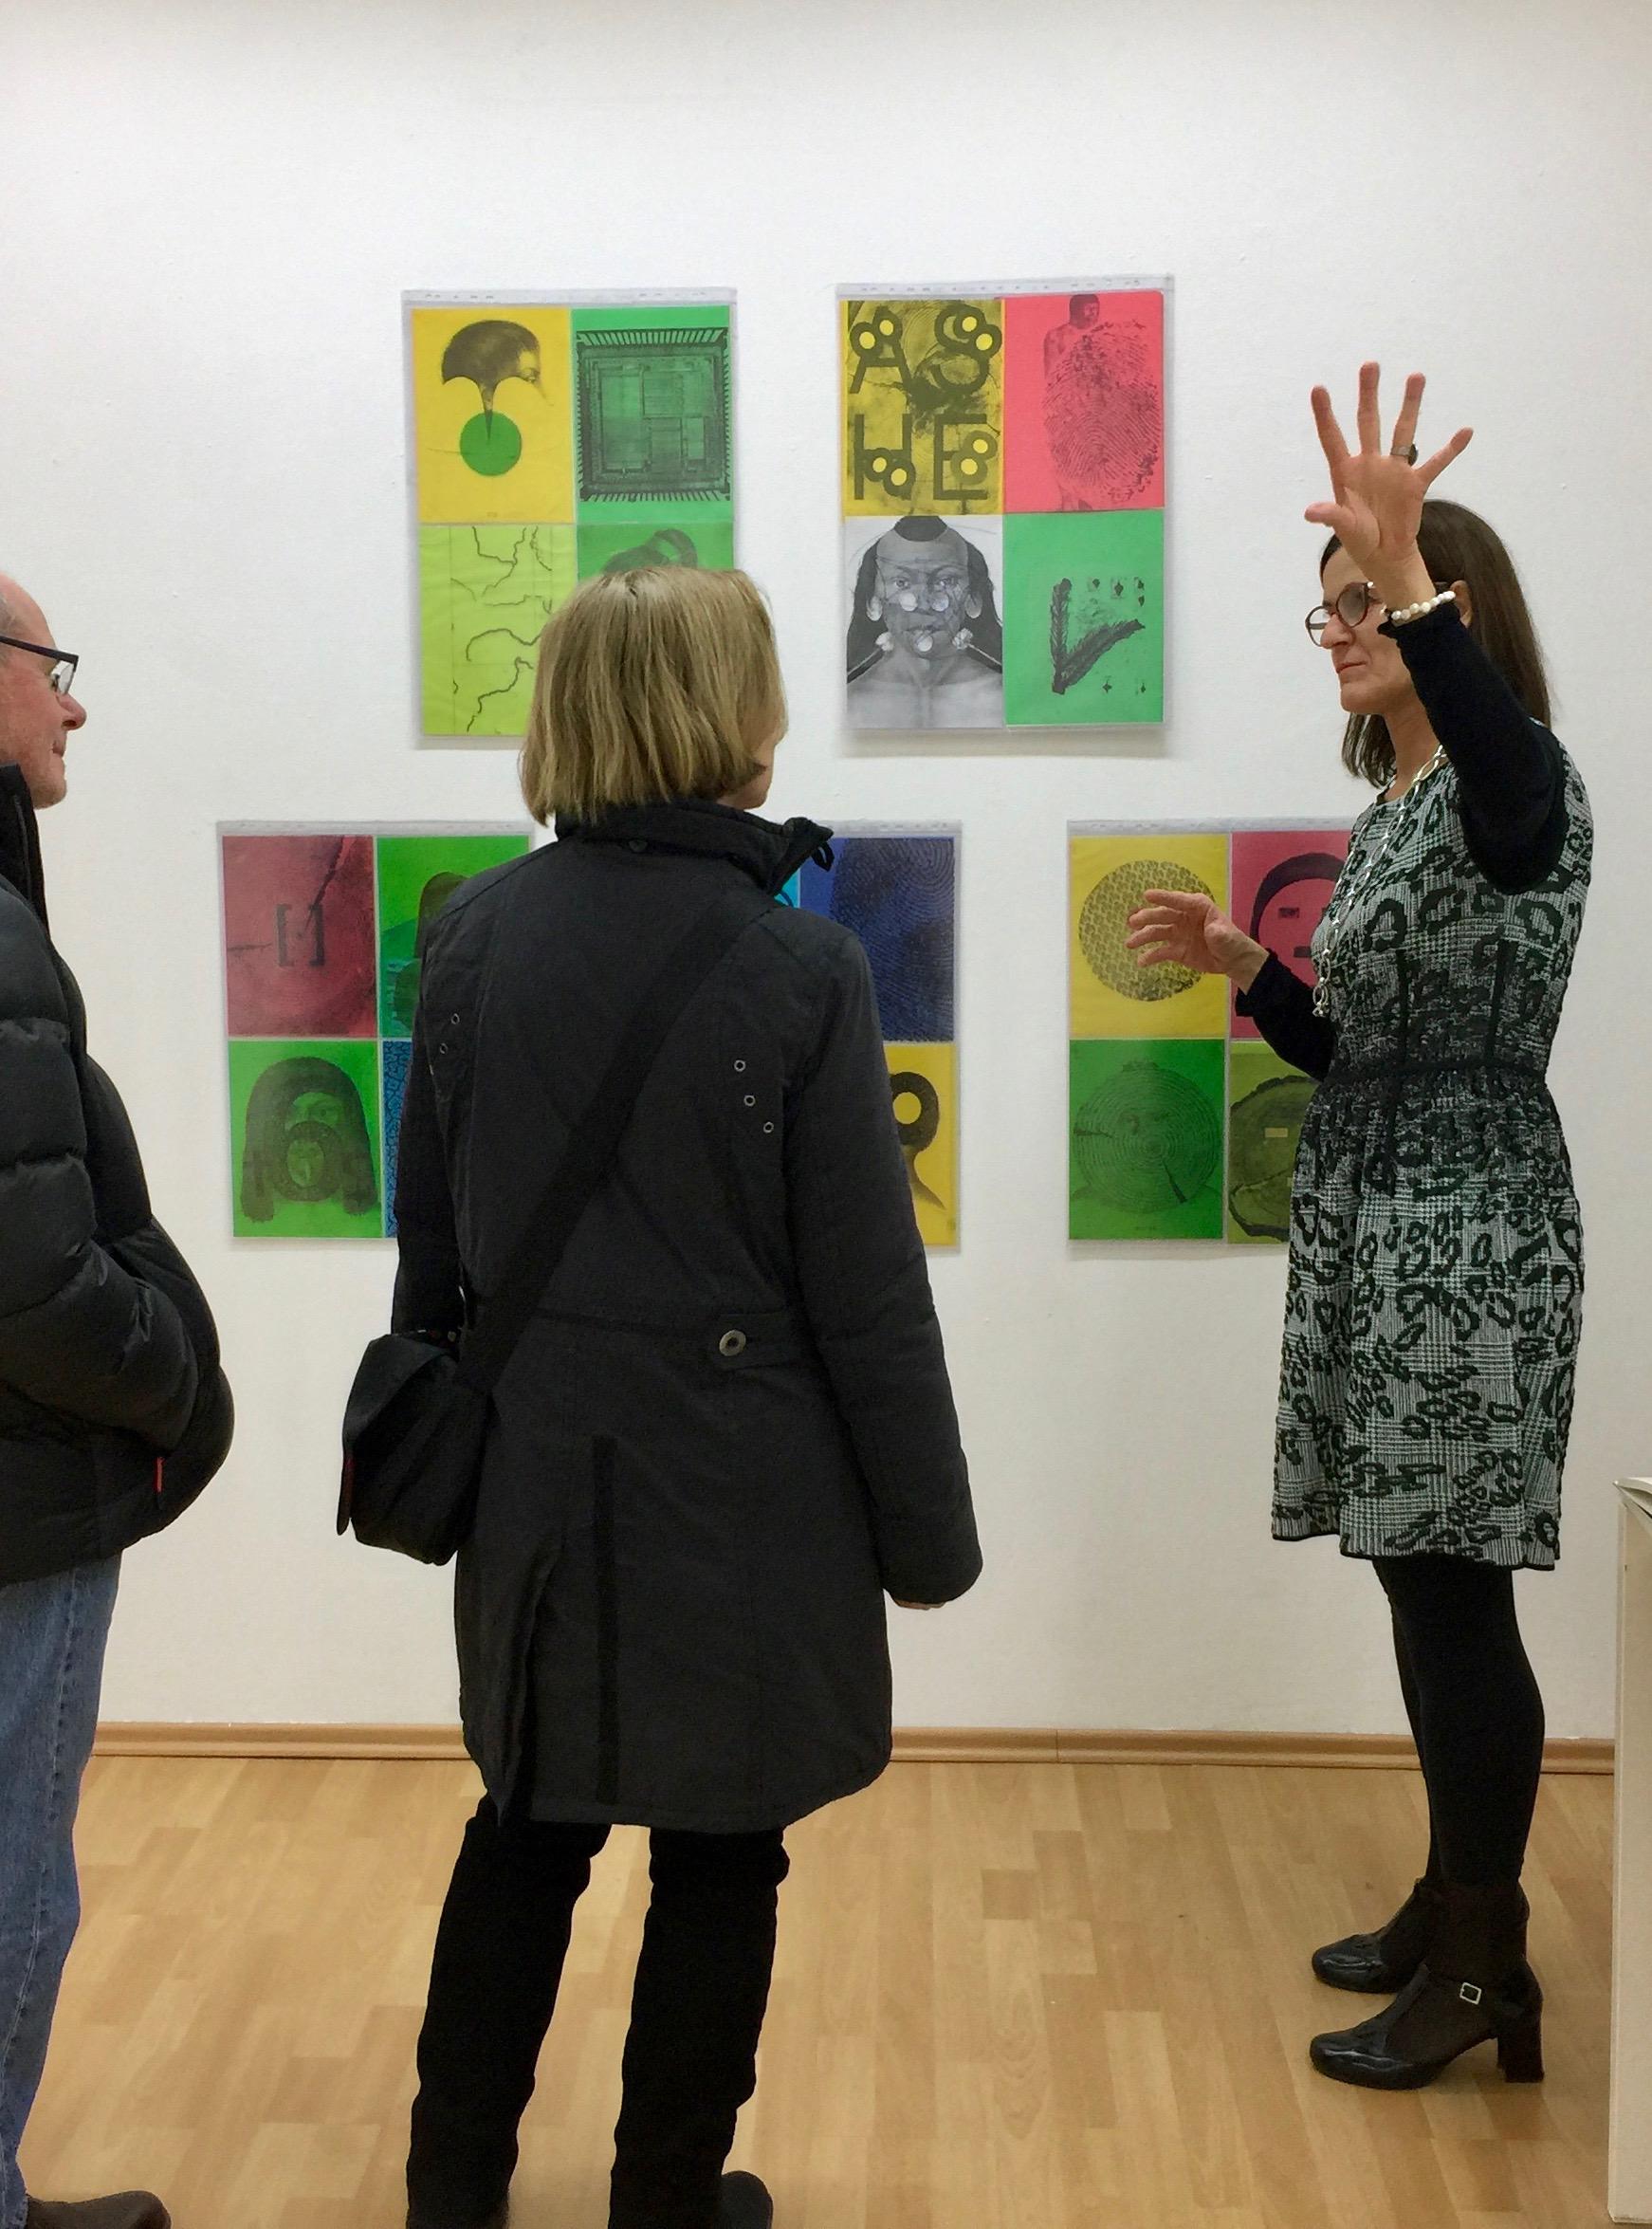 Curator Martina Merklinger showing the works of Cristina Barroso